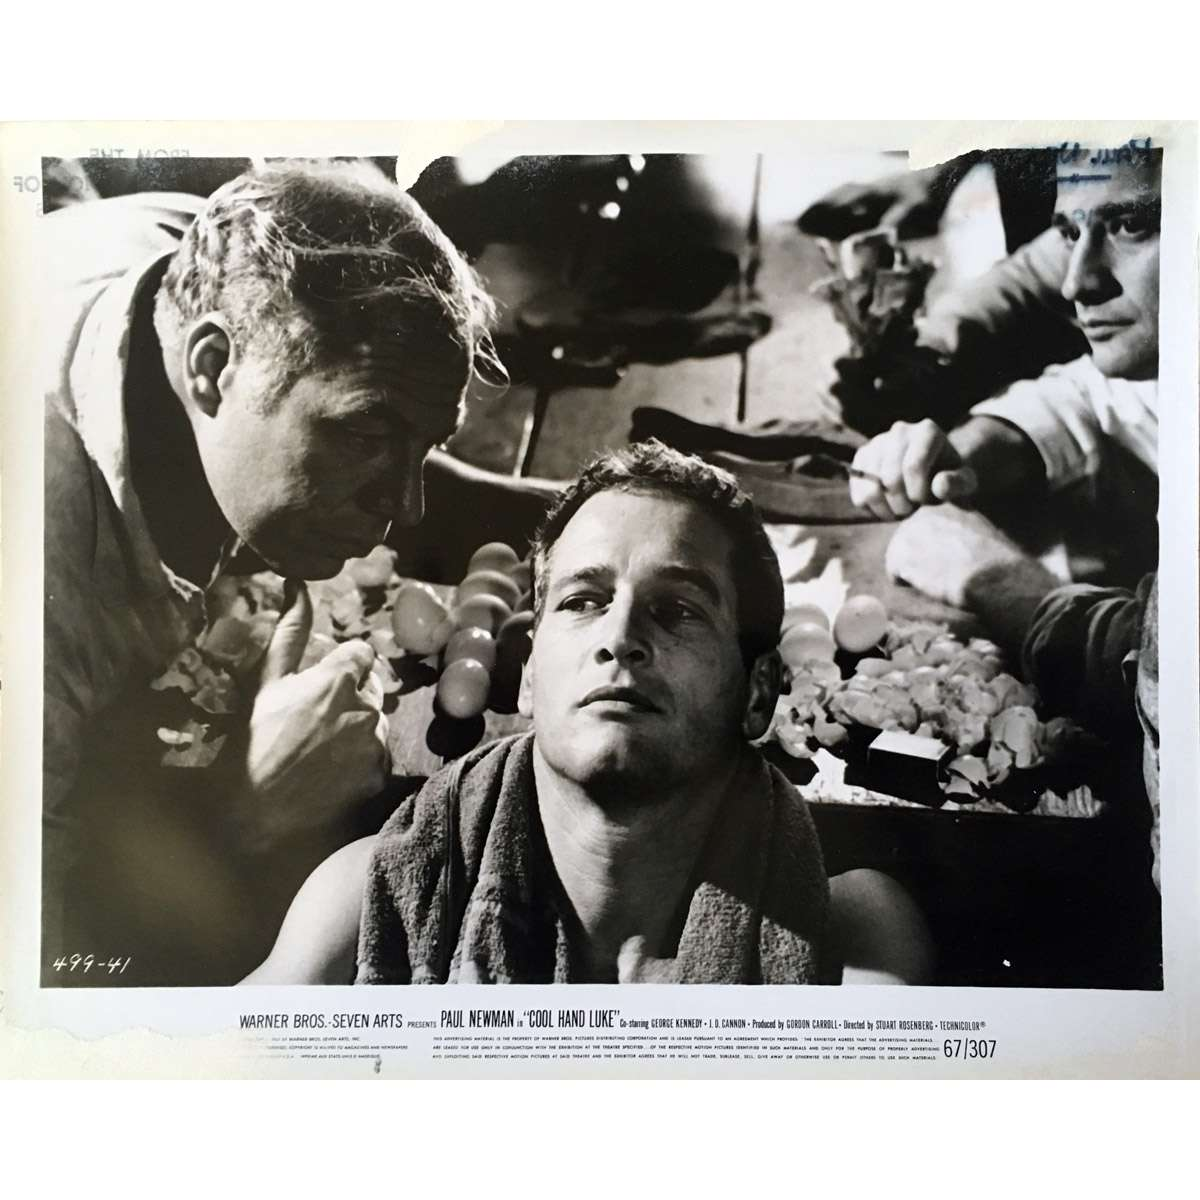 an analysis of cool hand luke a film by stuart rosenberg 1967 american prison drama film directed by stuart rosenberg edit language label description  cool hand luke (english) 0 references based on cool hand luke 0.